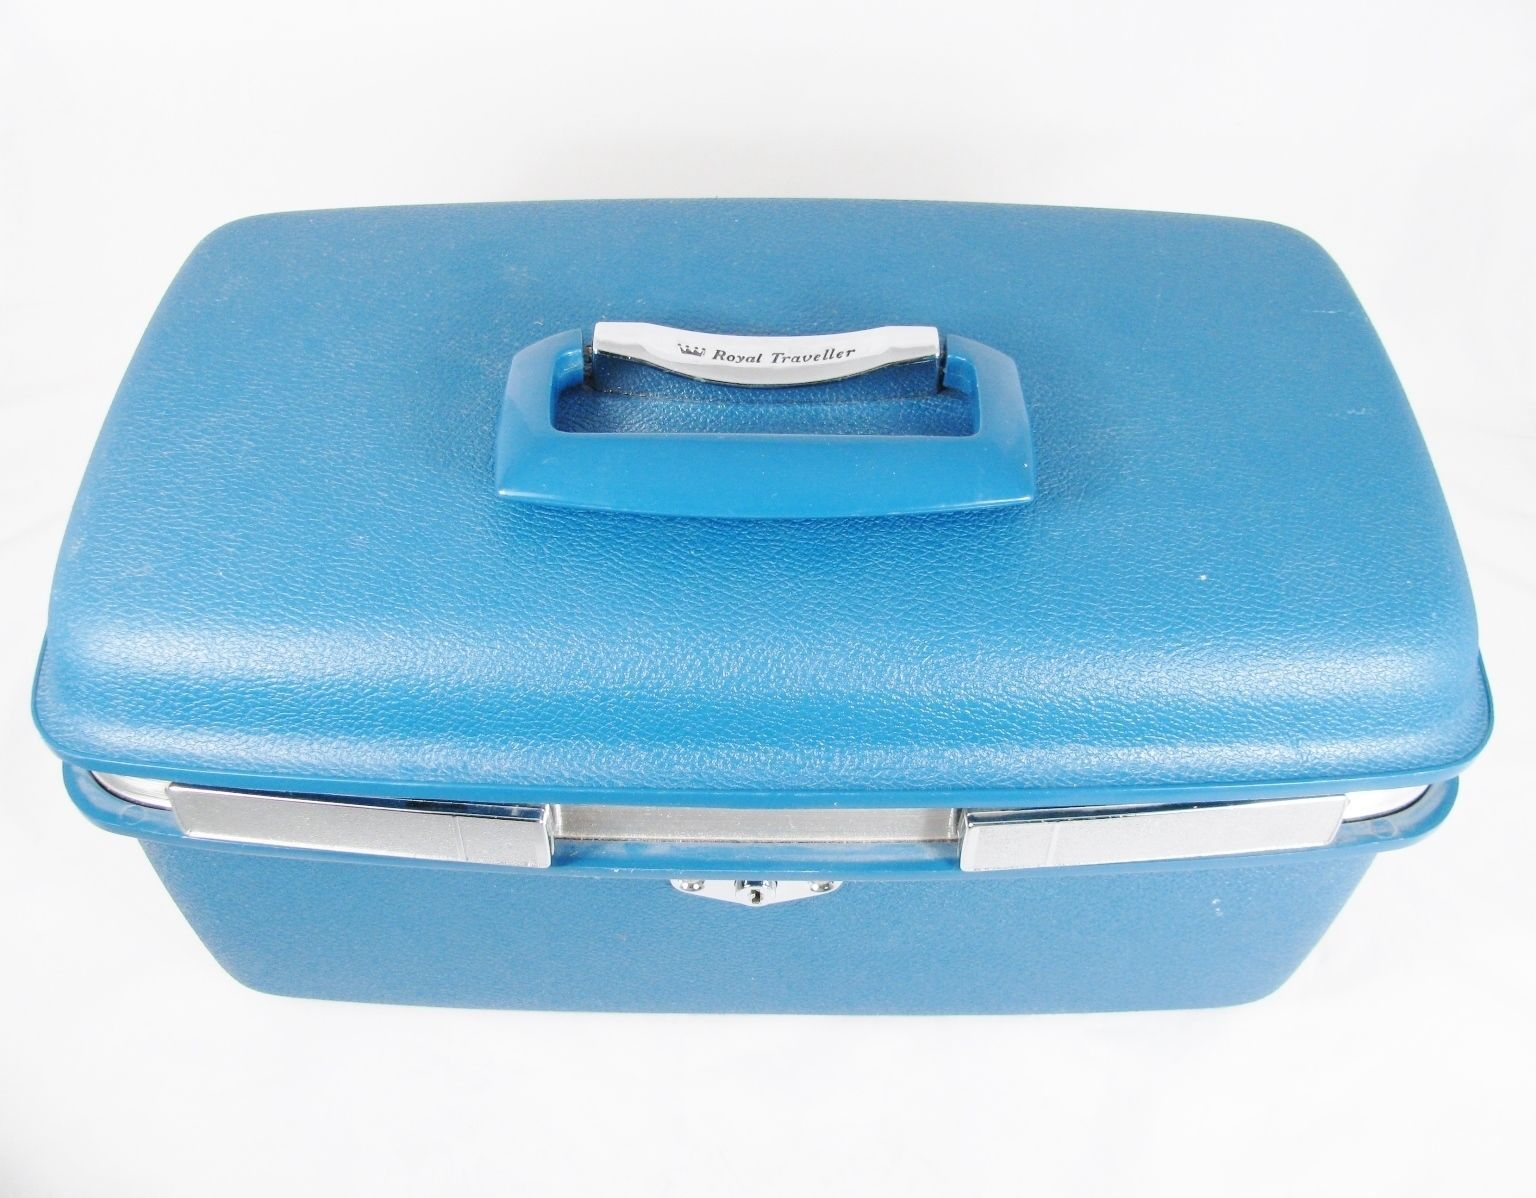 ROYAL TRAVELLER MONTBELLO Blue Makeup Train Overnight Travel Hardcase